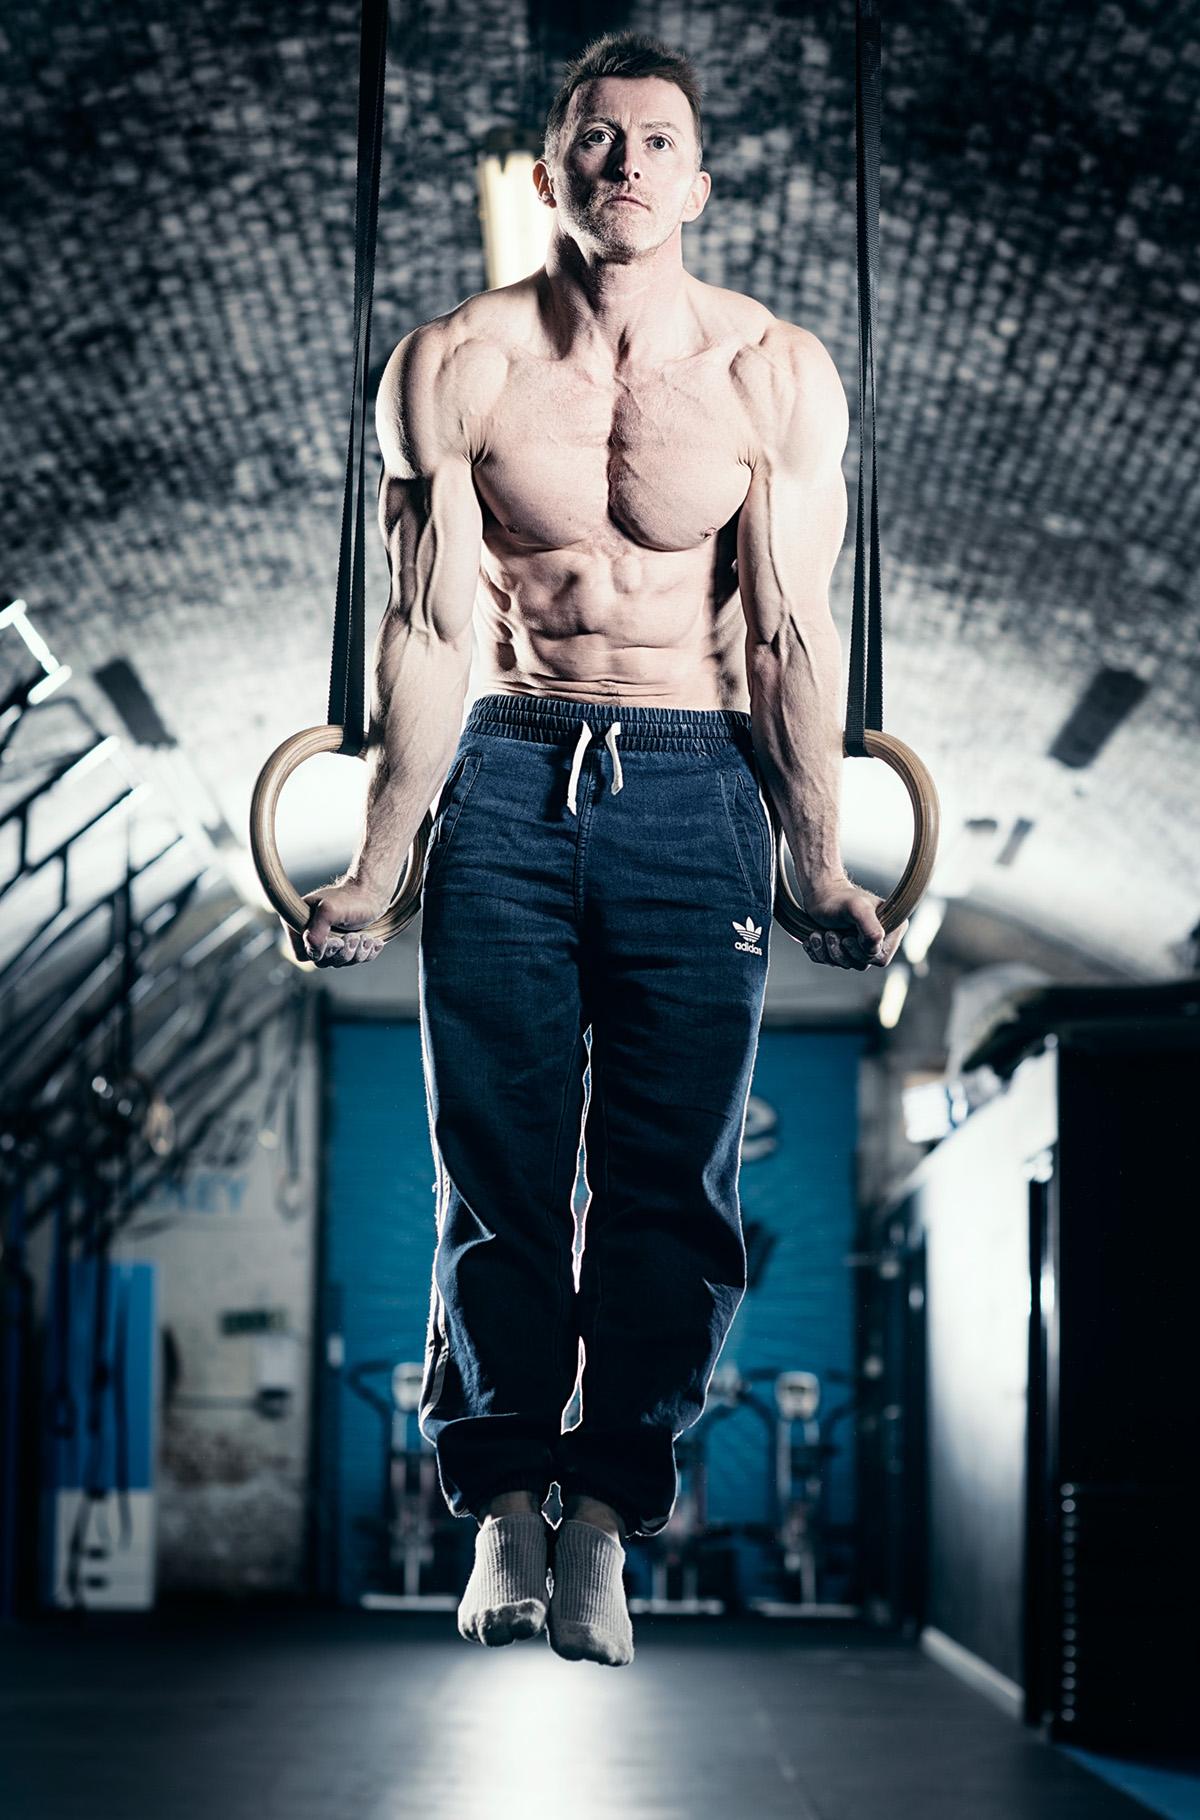 fitness,Calisthenics,Crossfit,Nikon,D800,profoto